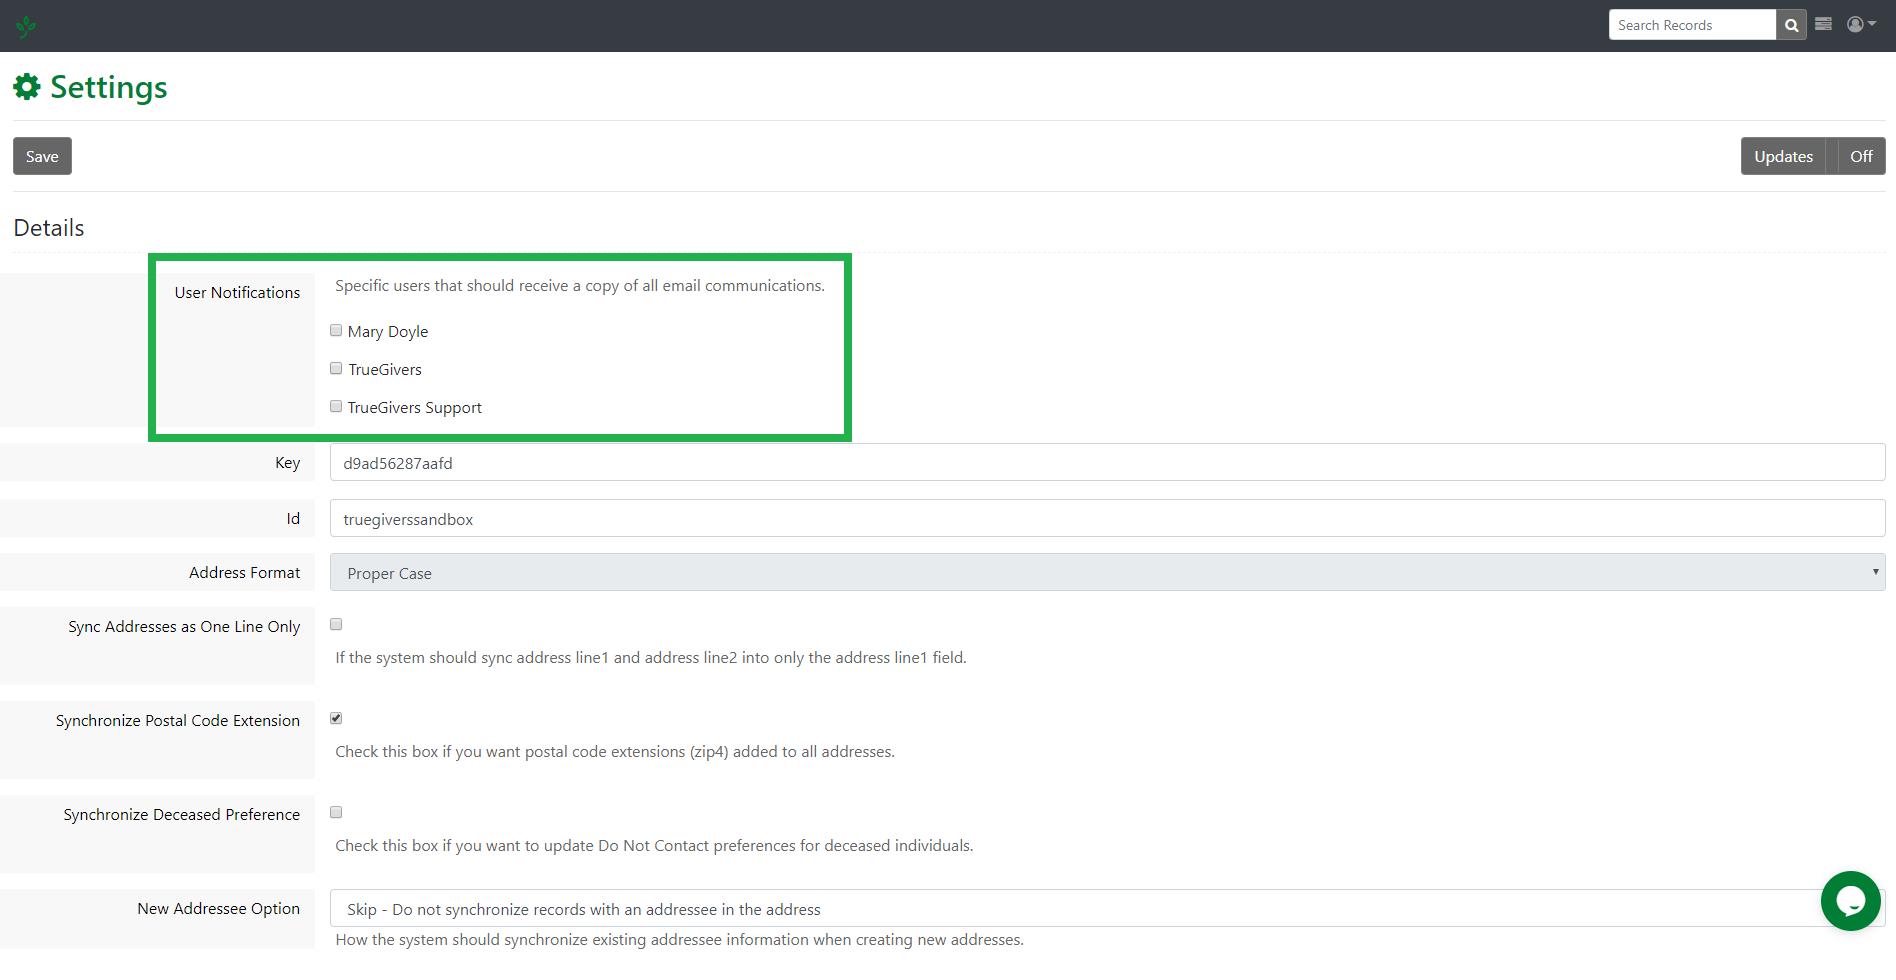 integration settings - user notifications